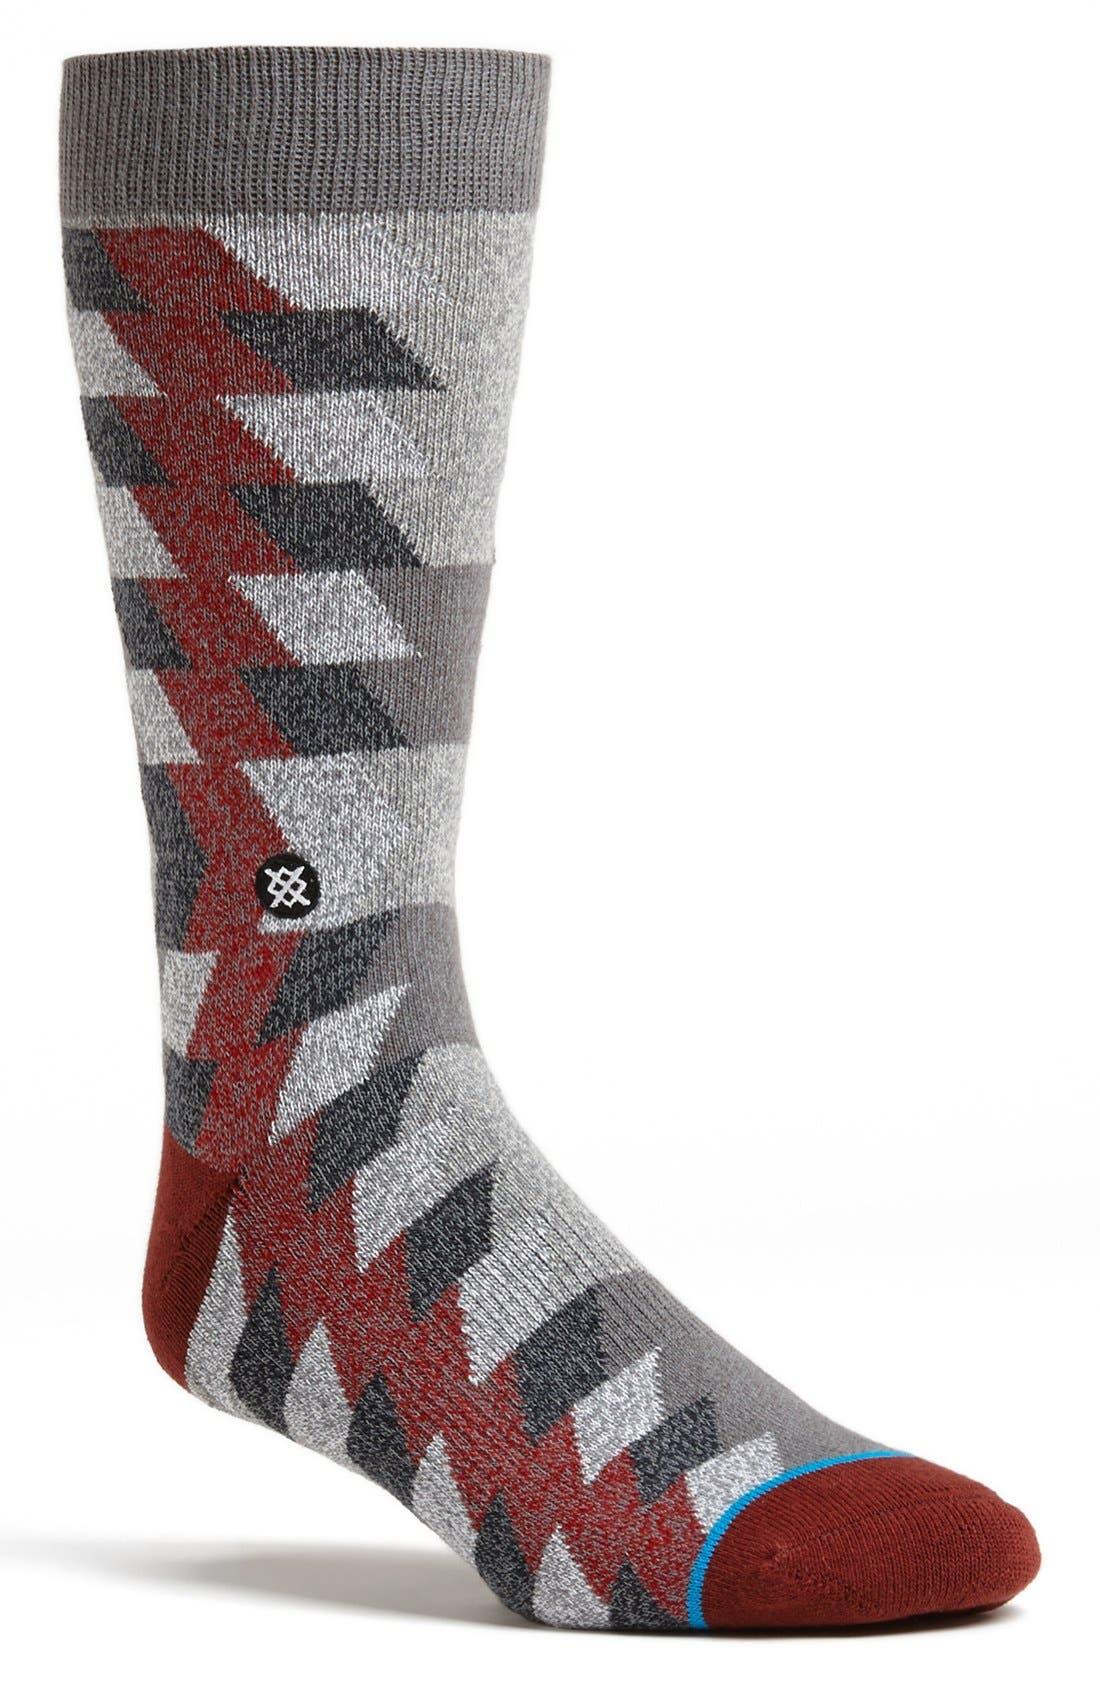 Alternate Image 1 Selected - Stance 'Shorewood' Socks